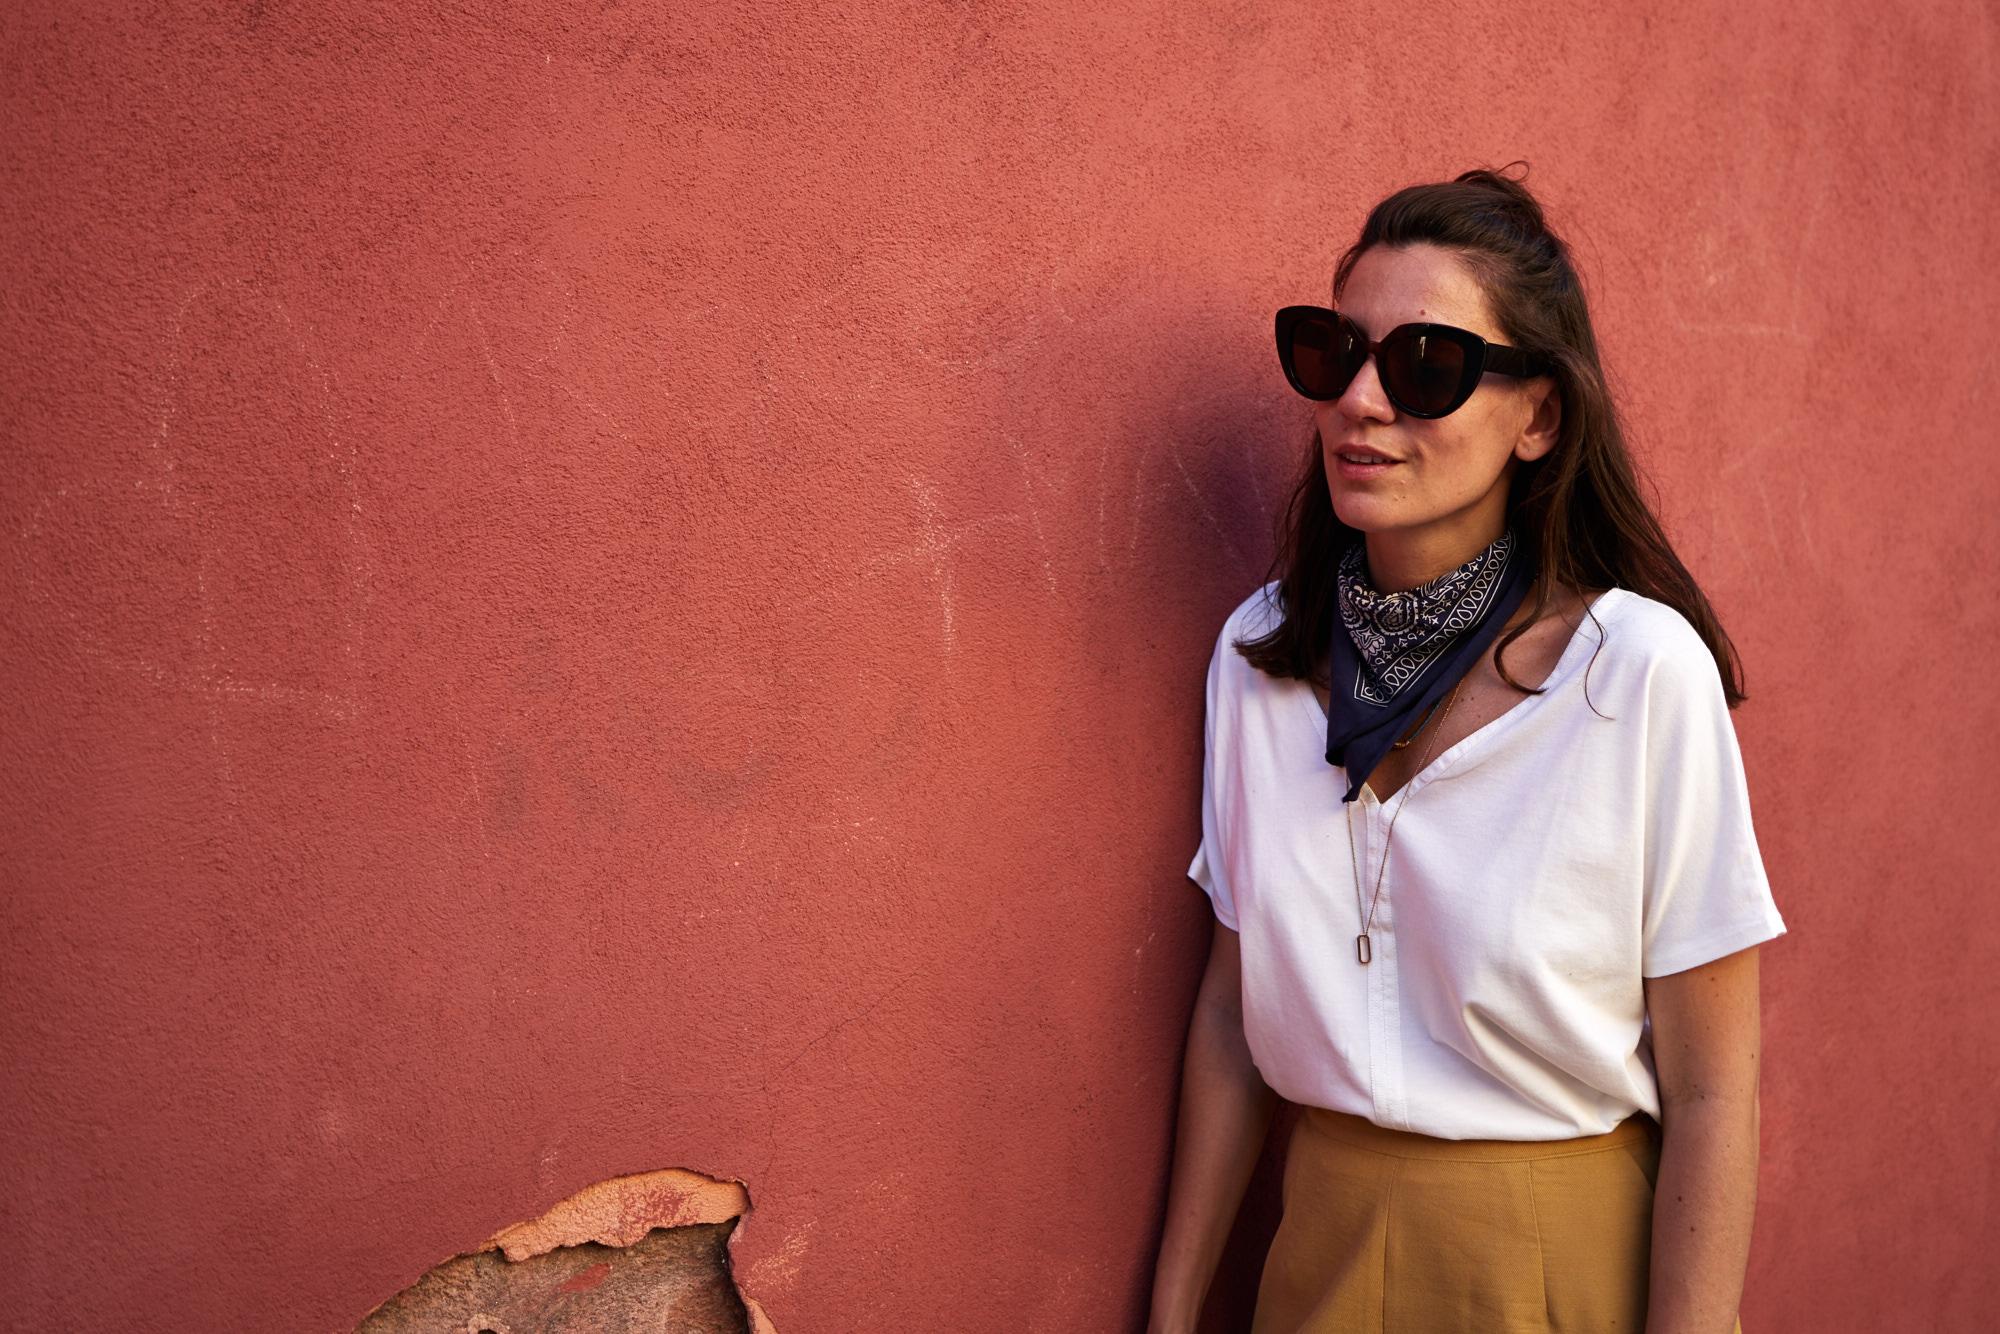 billur saatci, offnegiysem, street style, turkish style blogger, lug von siga, gül ağış, venice, venedik, tuula, tory burch